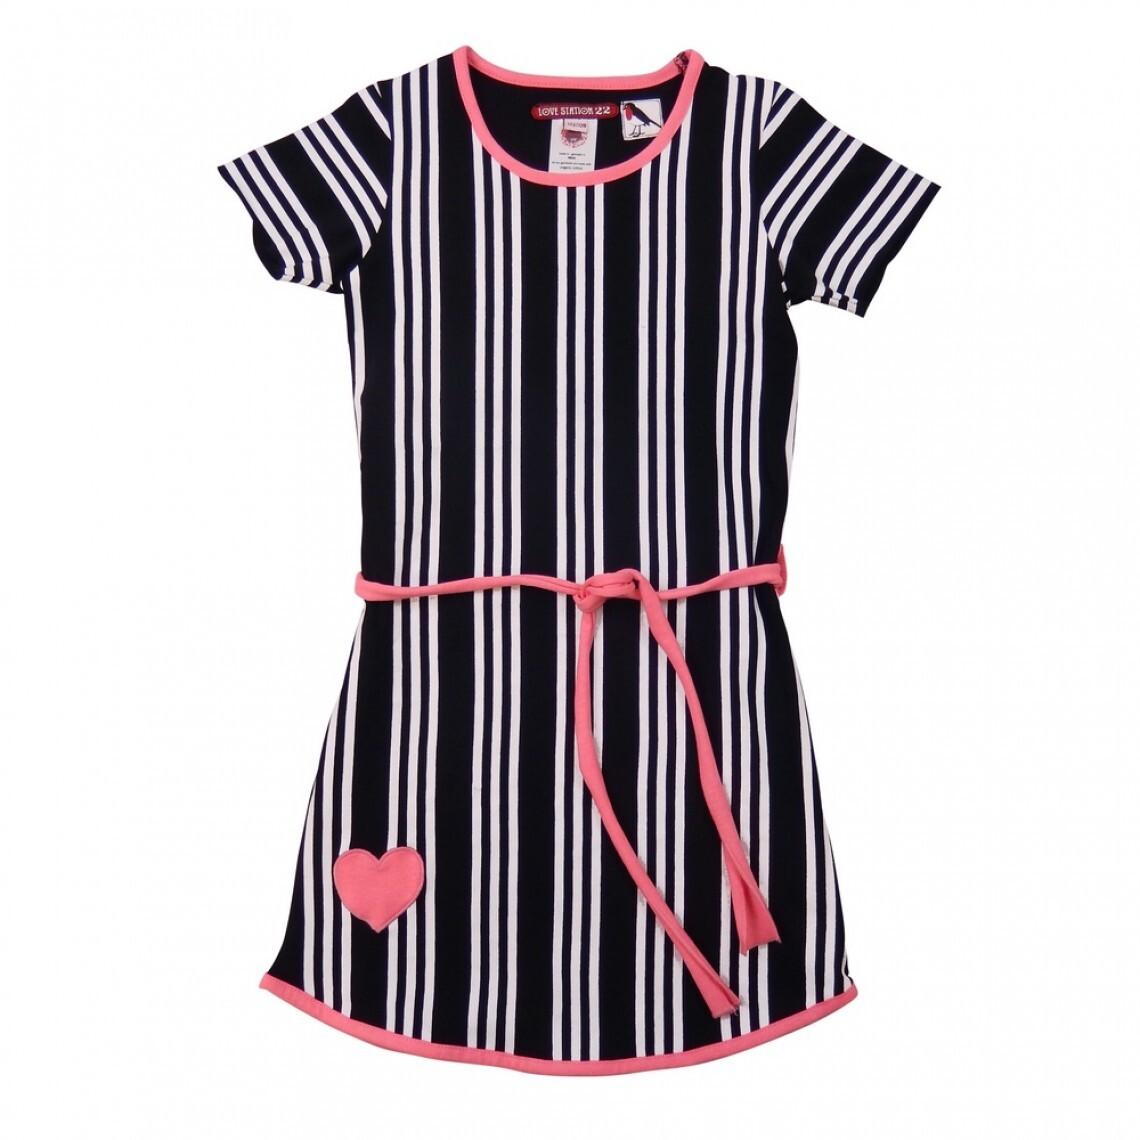 https://myshop.s3-external-3.amazonaws.com/shop3044400.pictures.lovestation22-dress-yfke-bw.jpg